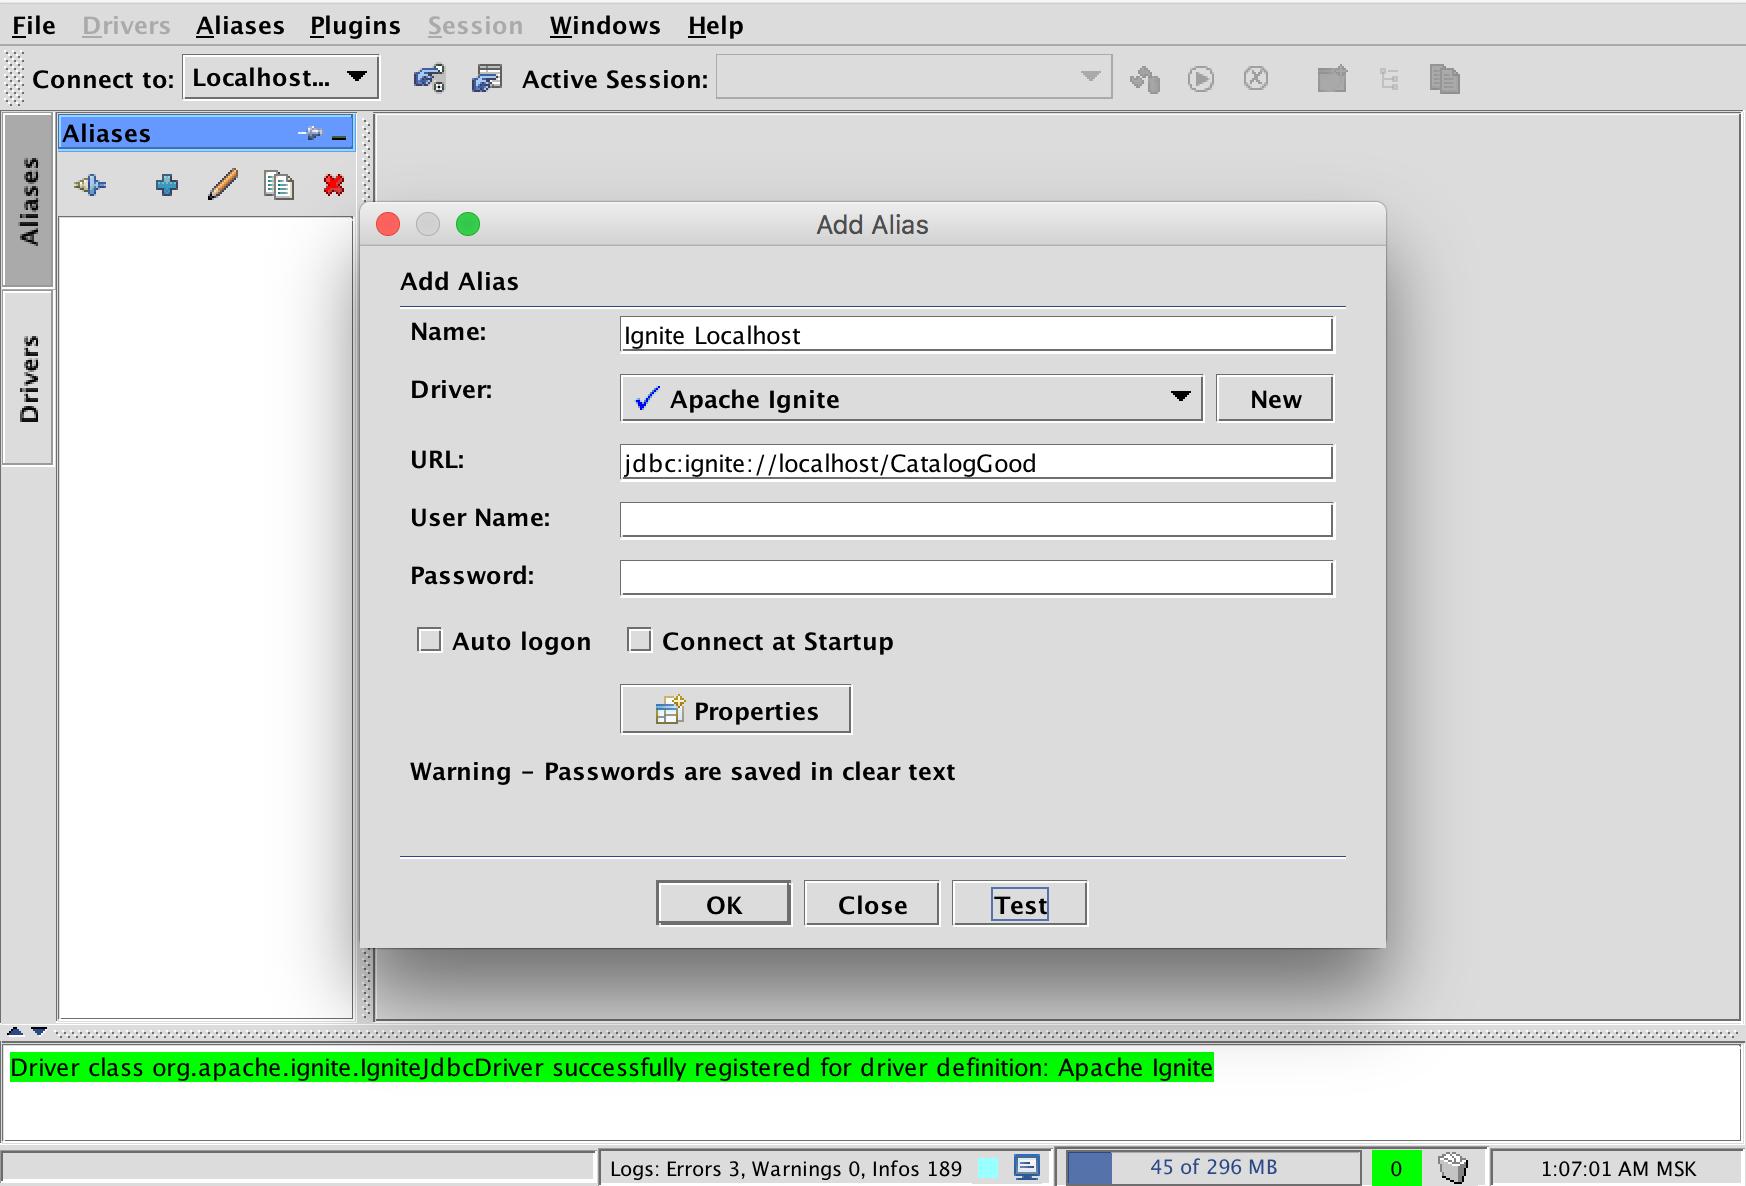 add alias screenshot